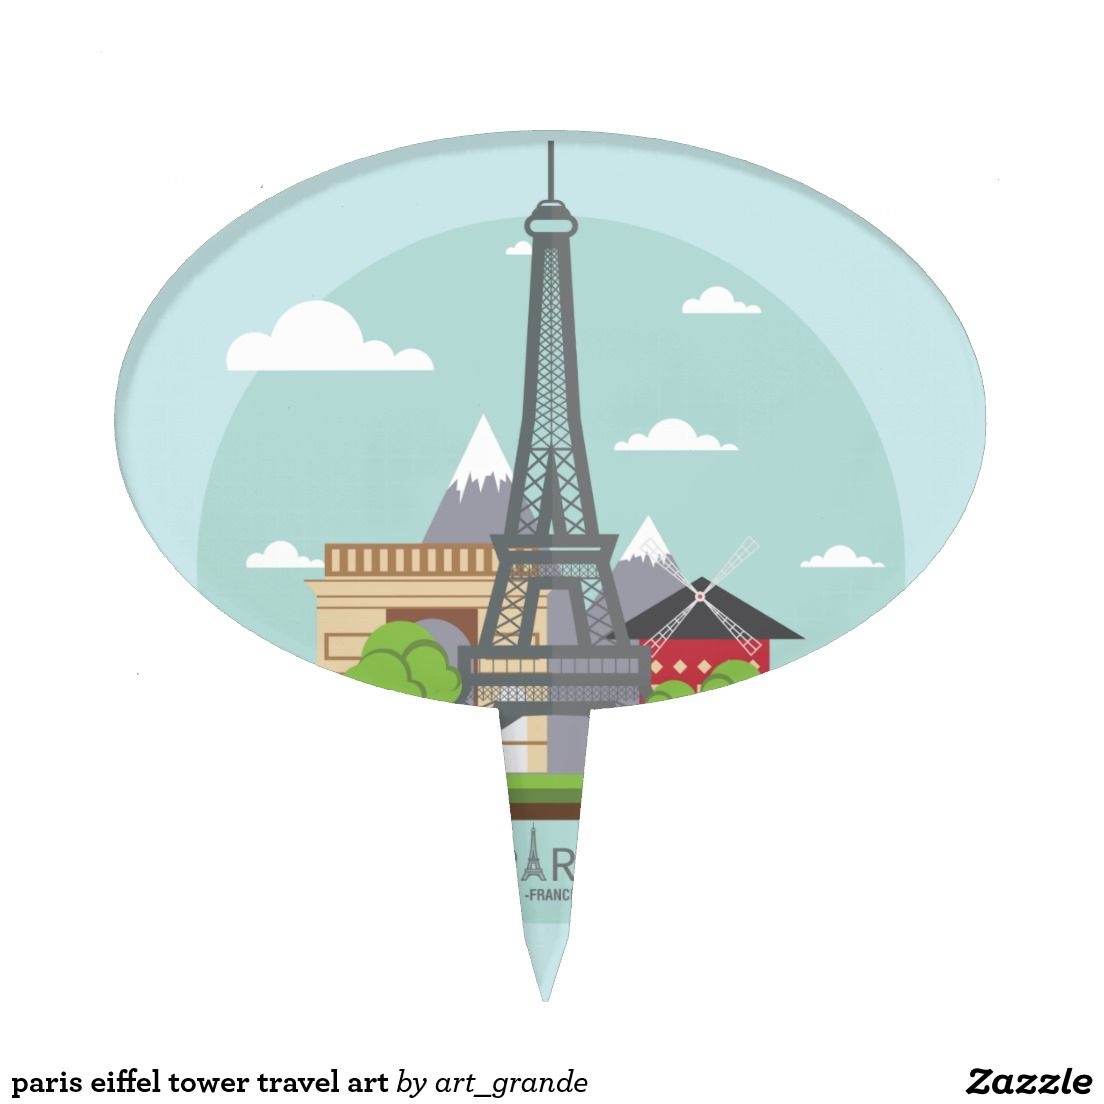 paris eiffel tower travel art cake topper